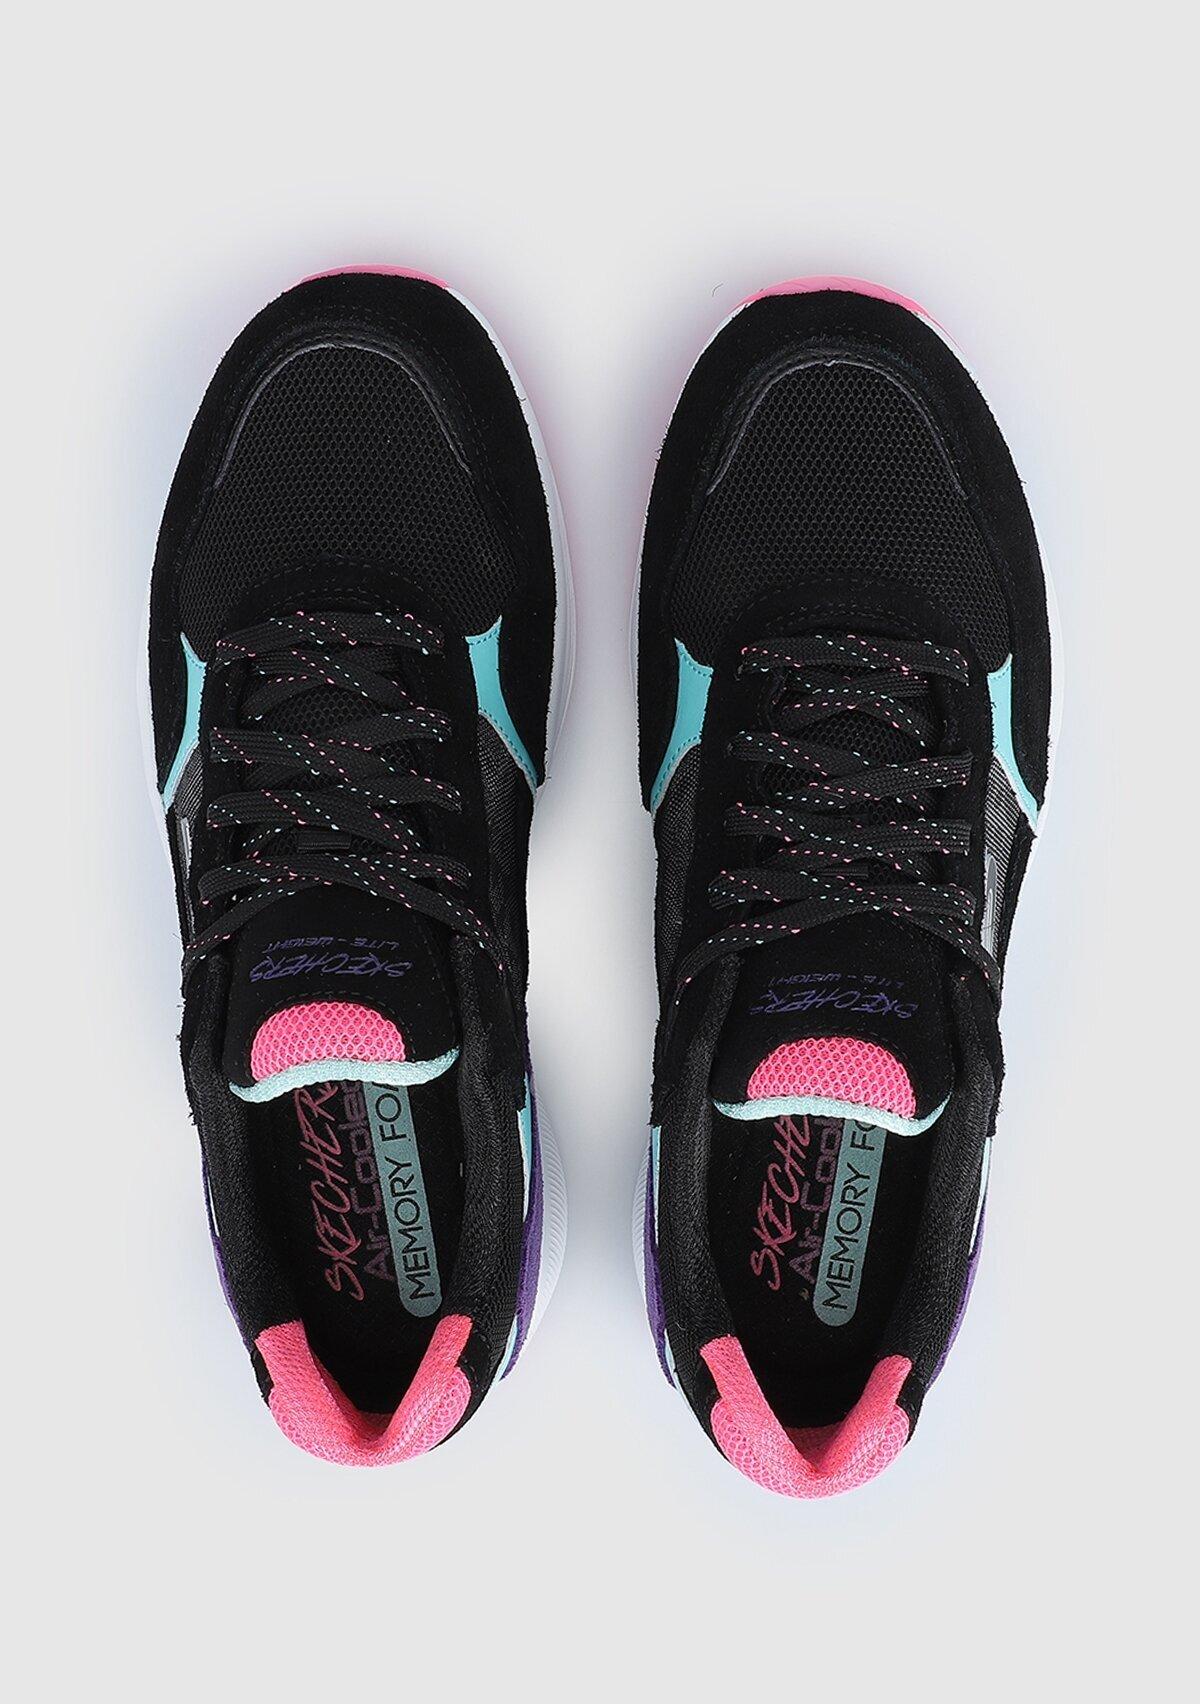 resm Meridian Siyah Kadın Sneaker 13020Bkmt